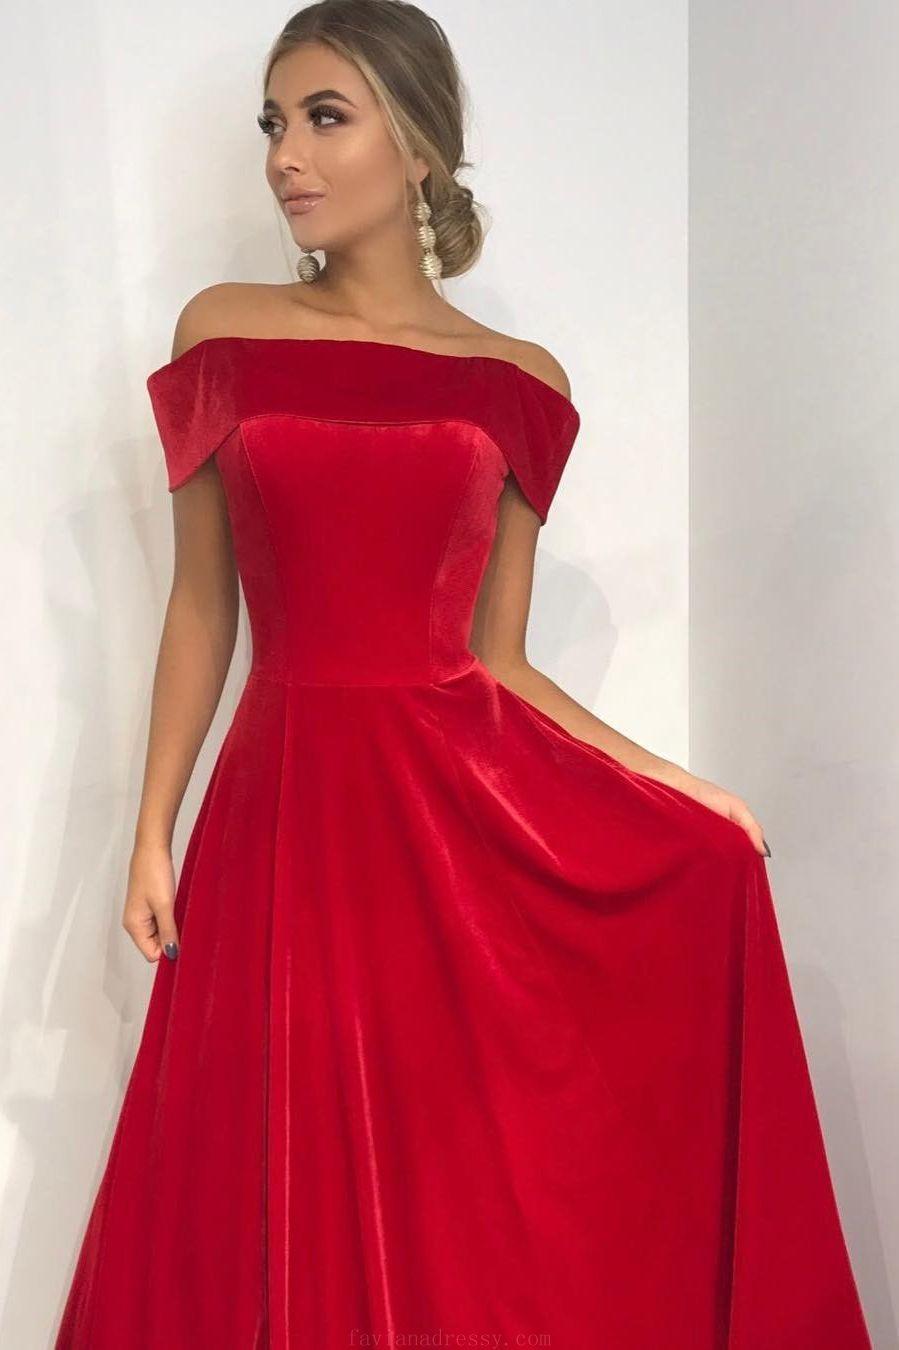 Prom dresses long promdresseslong cheap prom dresses